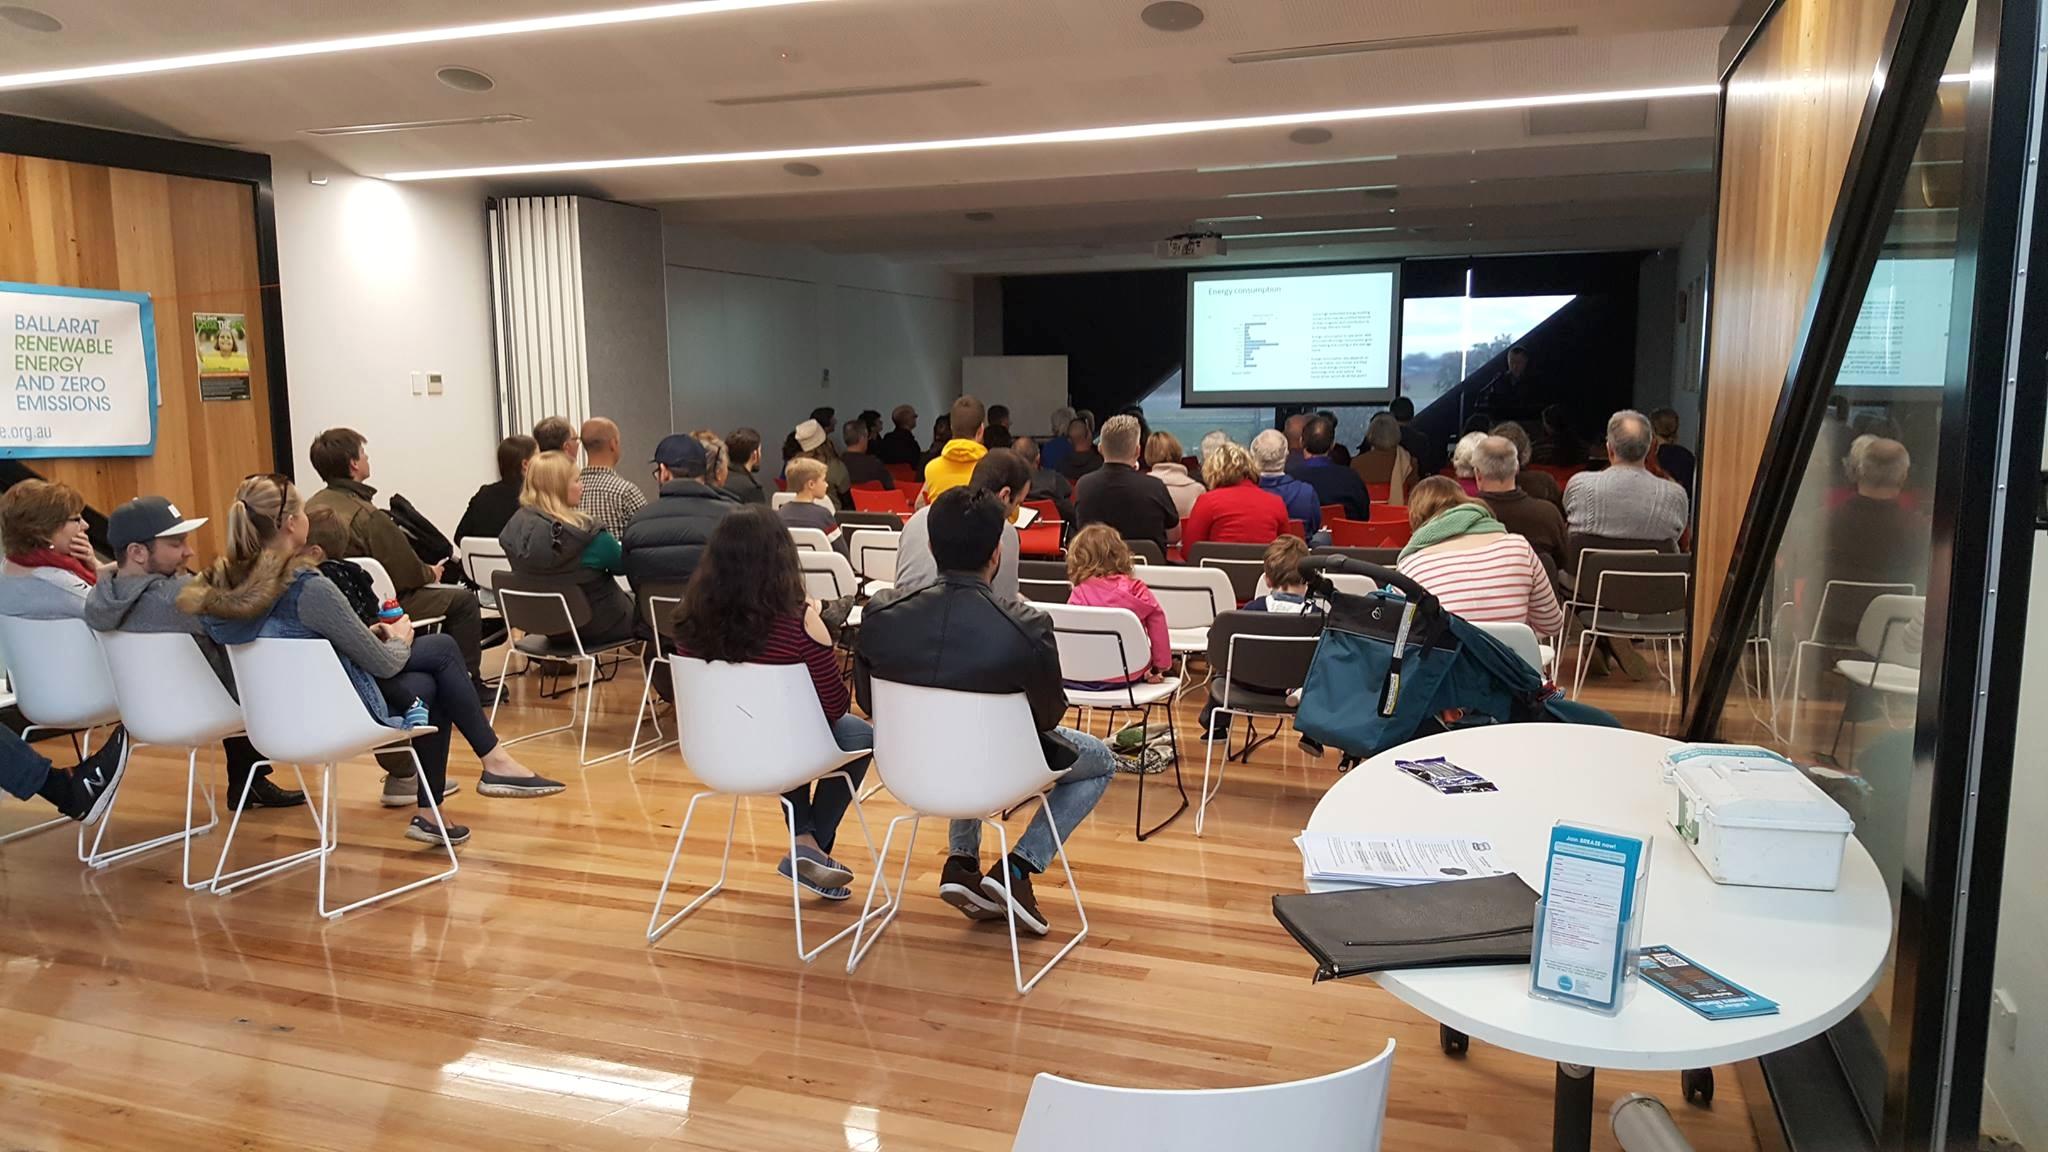 Ballarat Community Health at Lucas